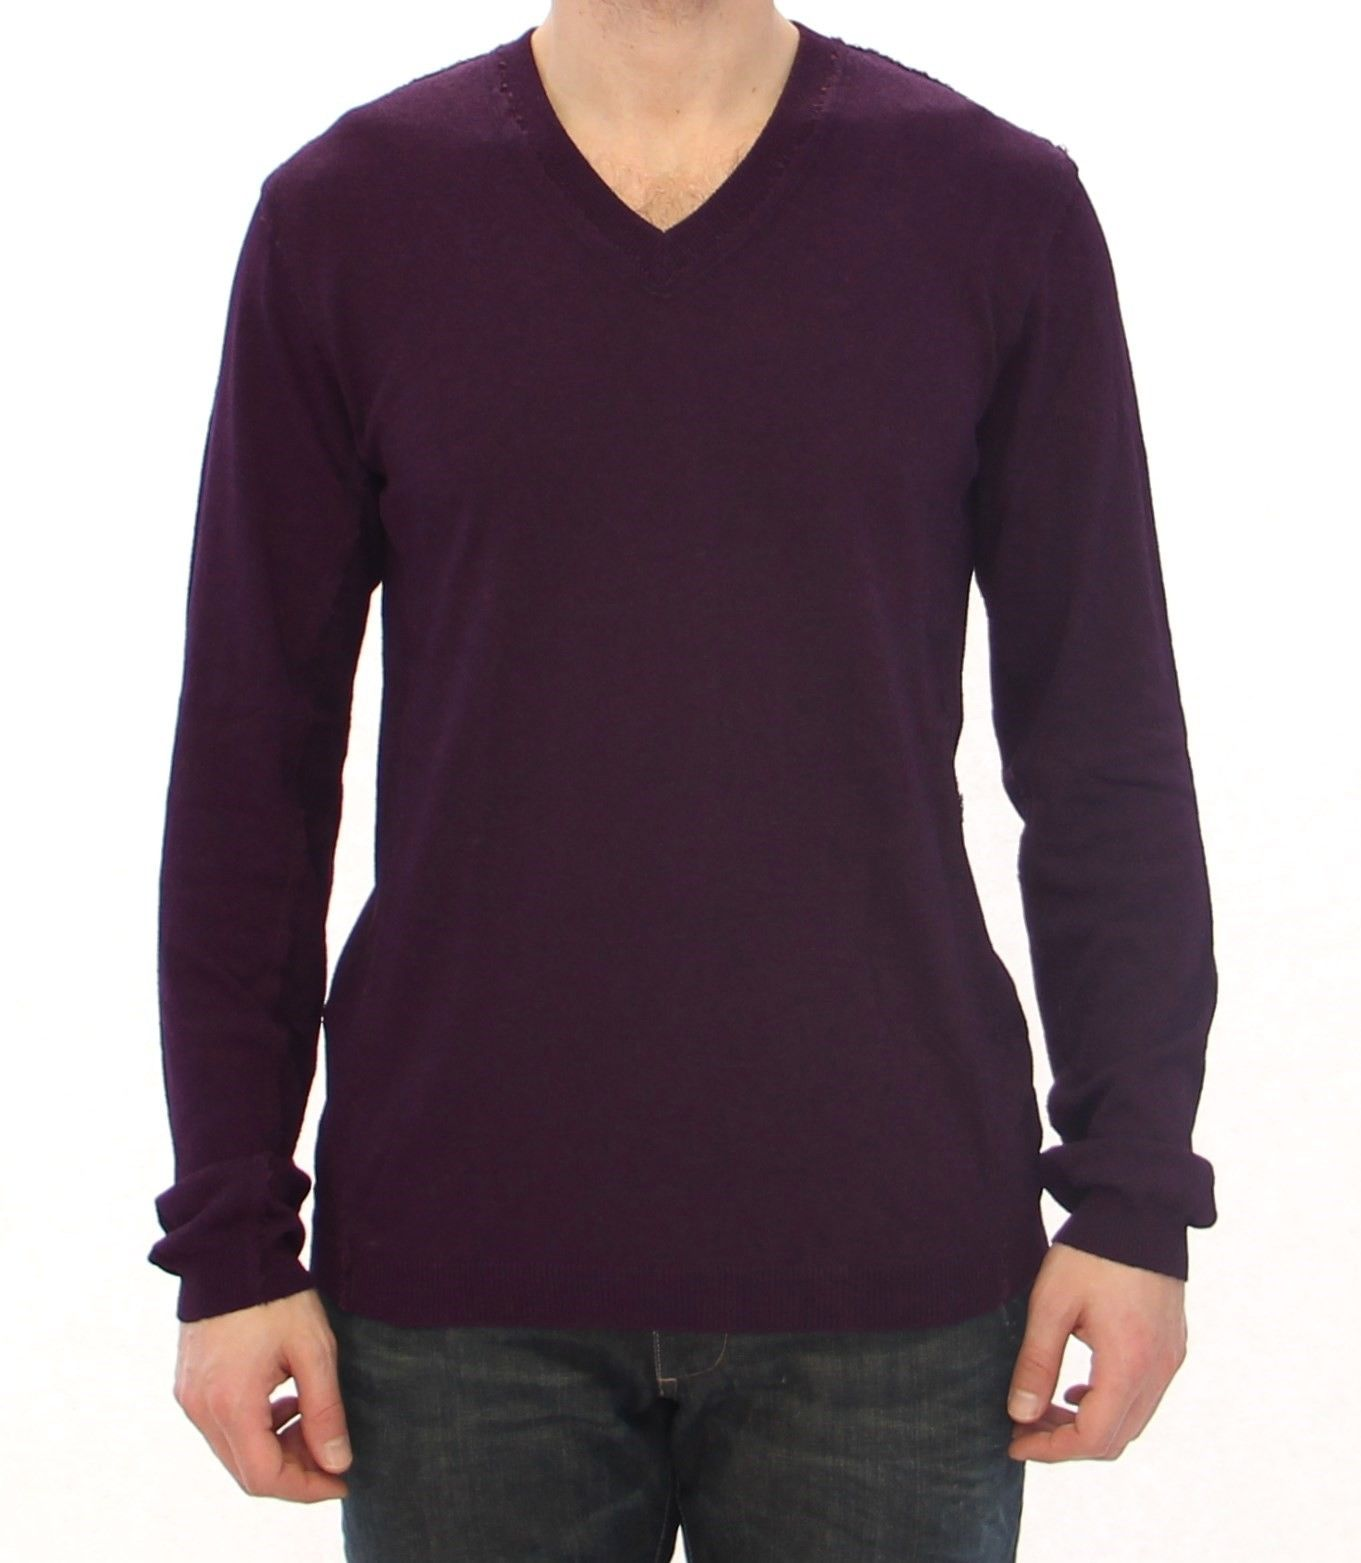 Dolce & Gabbana Men's Rayon Logo Logo V-neck Sweater Purple GTH10886 - IT48 | M